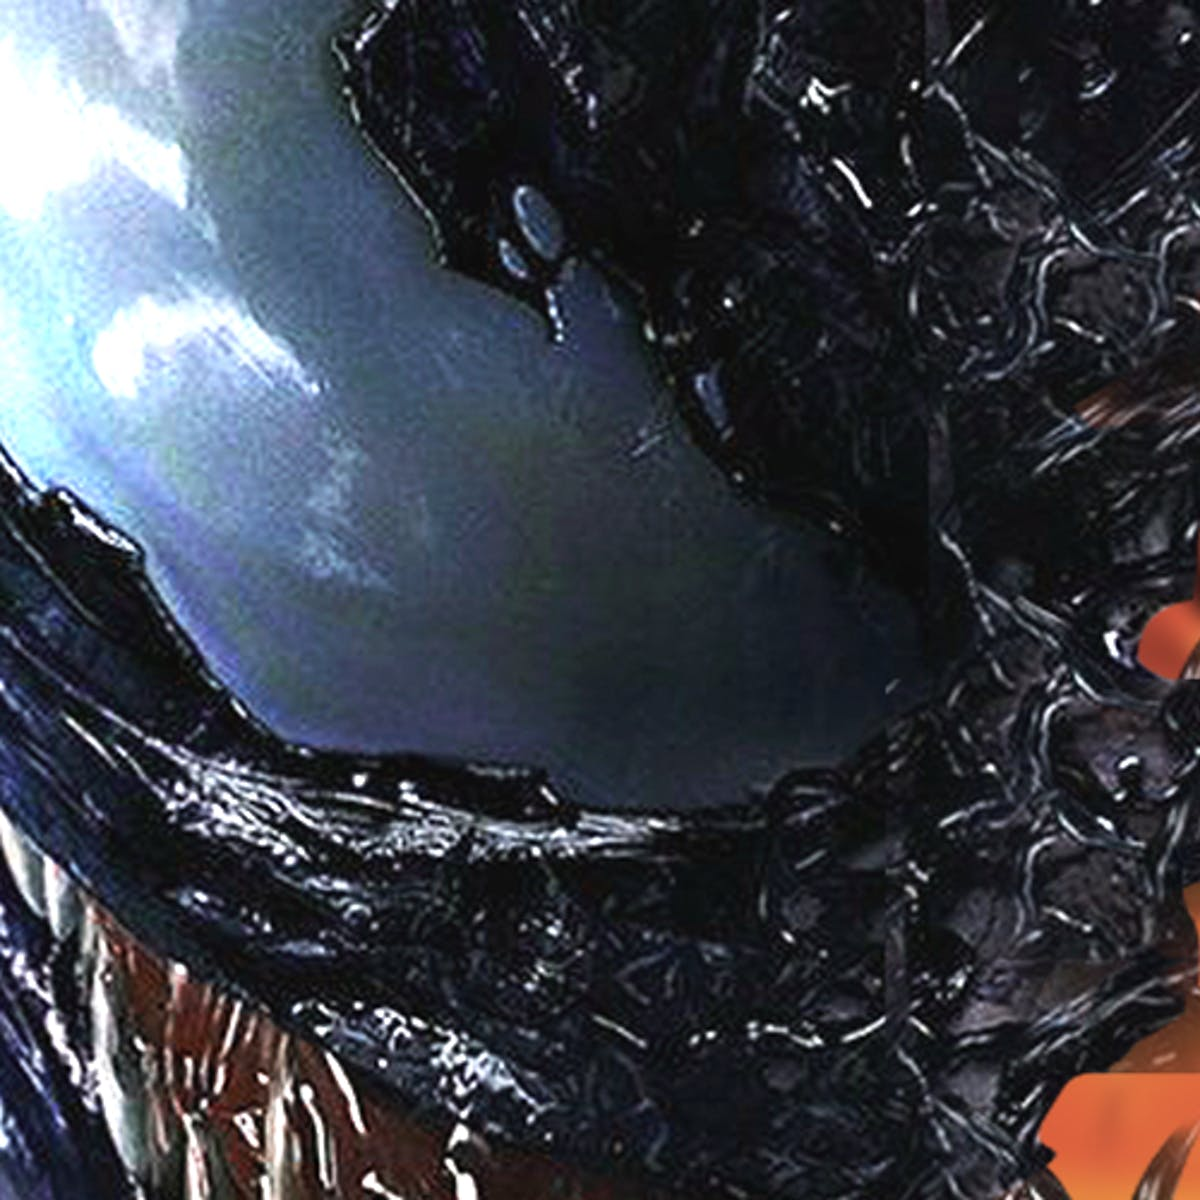 Venom Carnage Ending Spoilers How Woody Harrelson Sets Up Venom 2